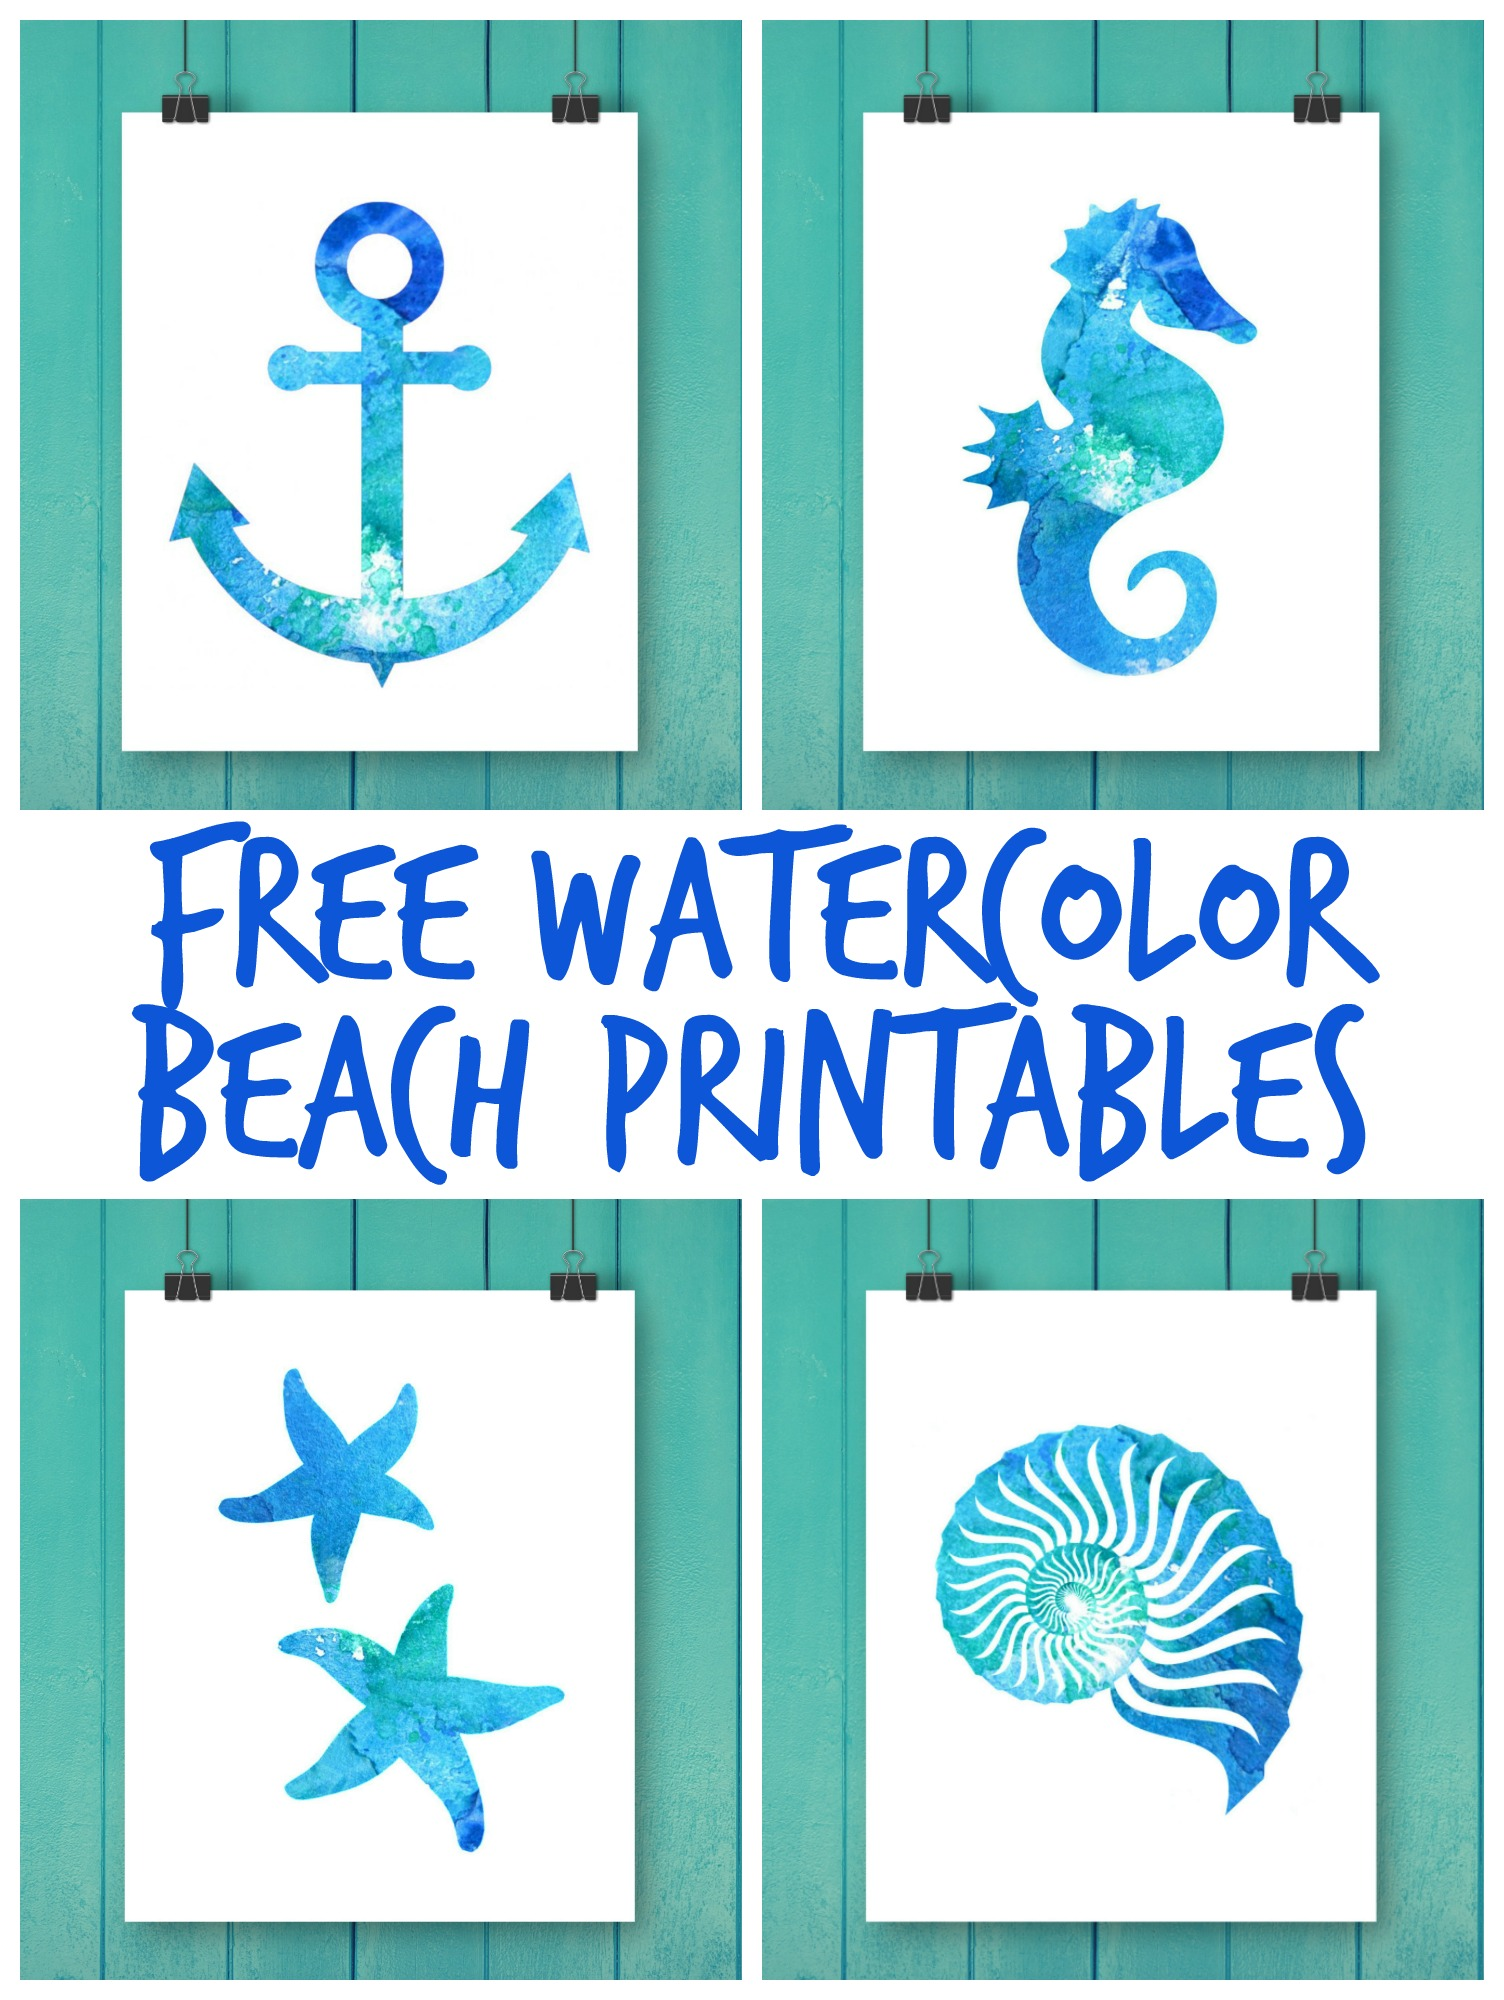 Free Watercolor Beach Printables